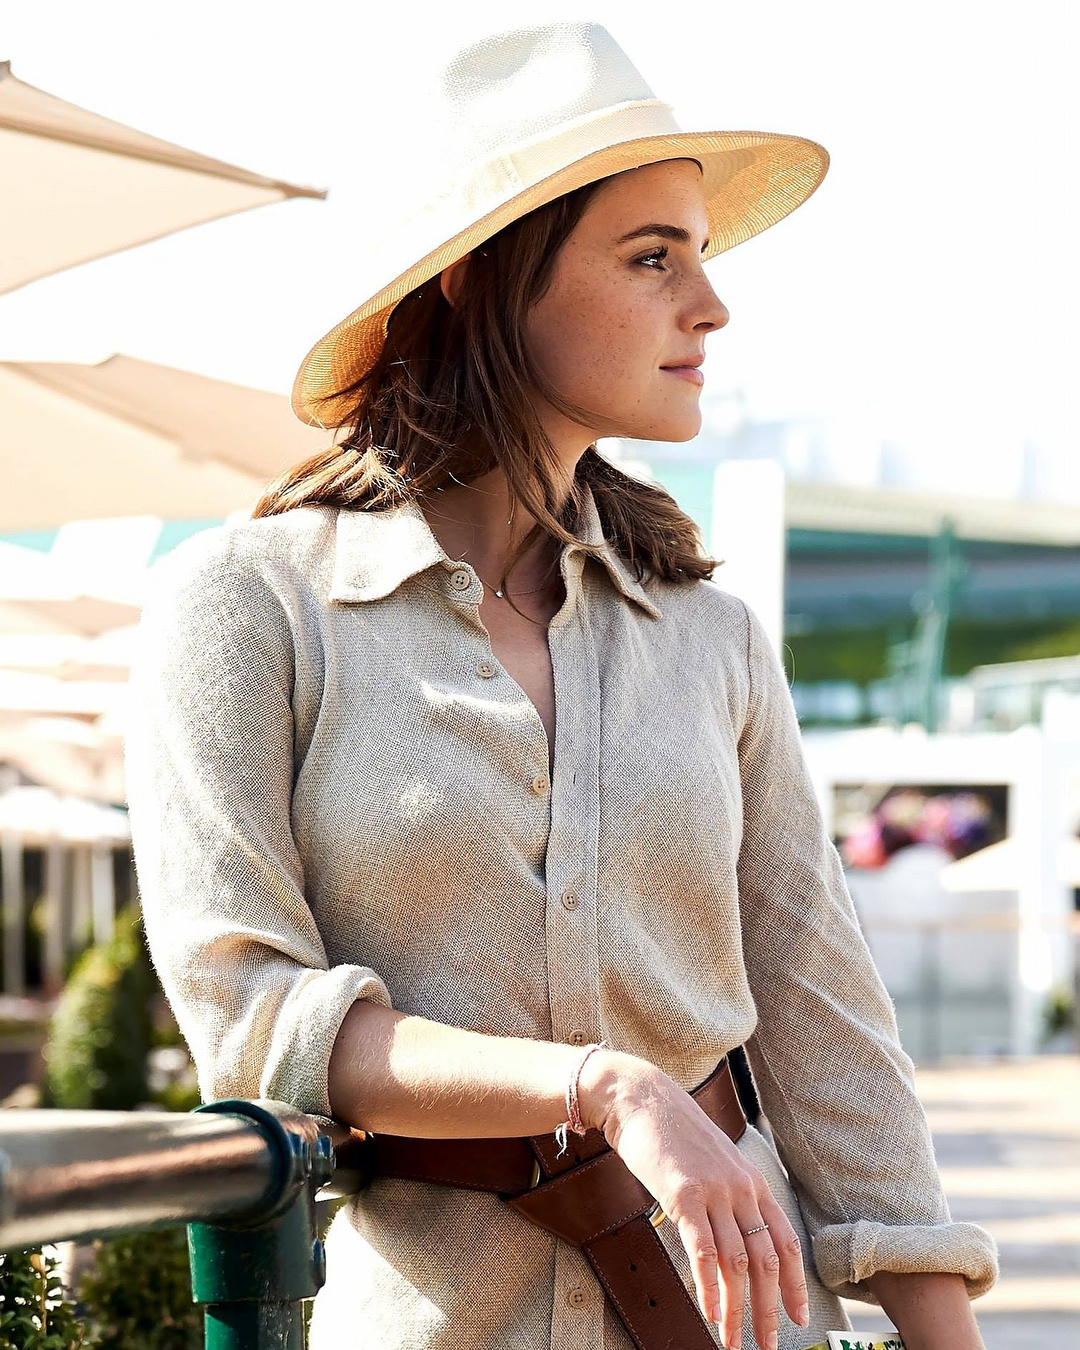 Emma Watson Photos| Emma Watson Pictures | Emma Watson Images